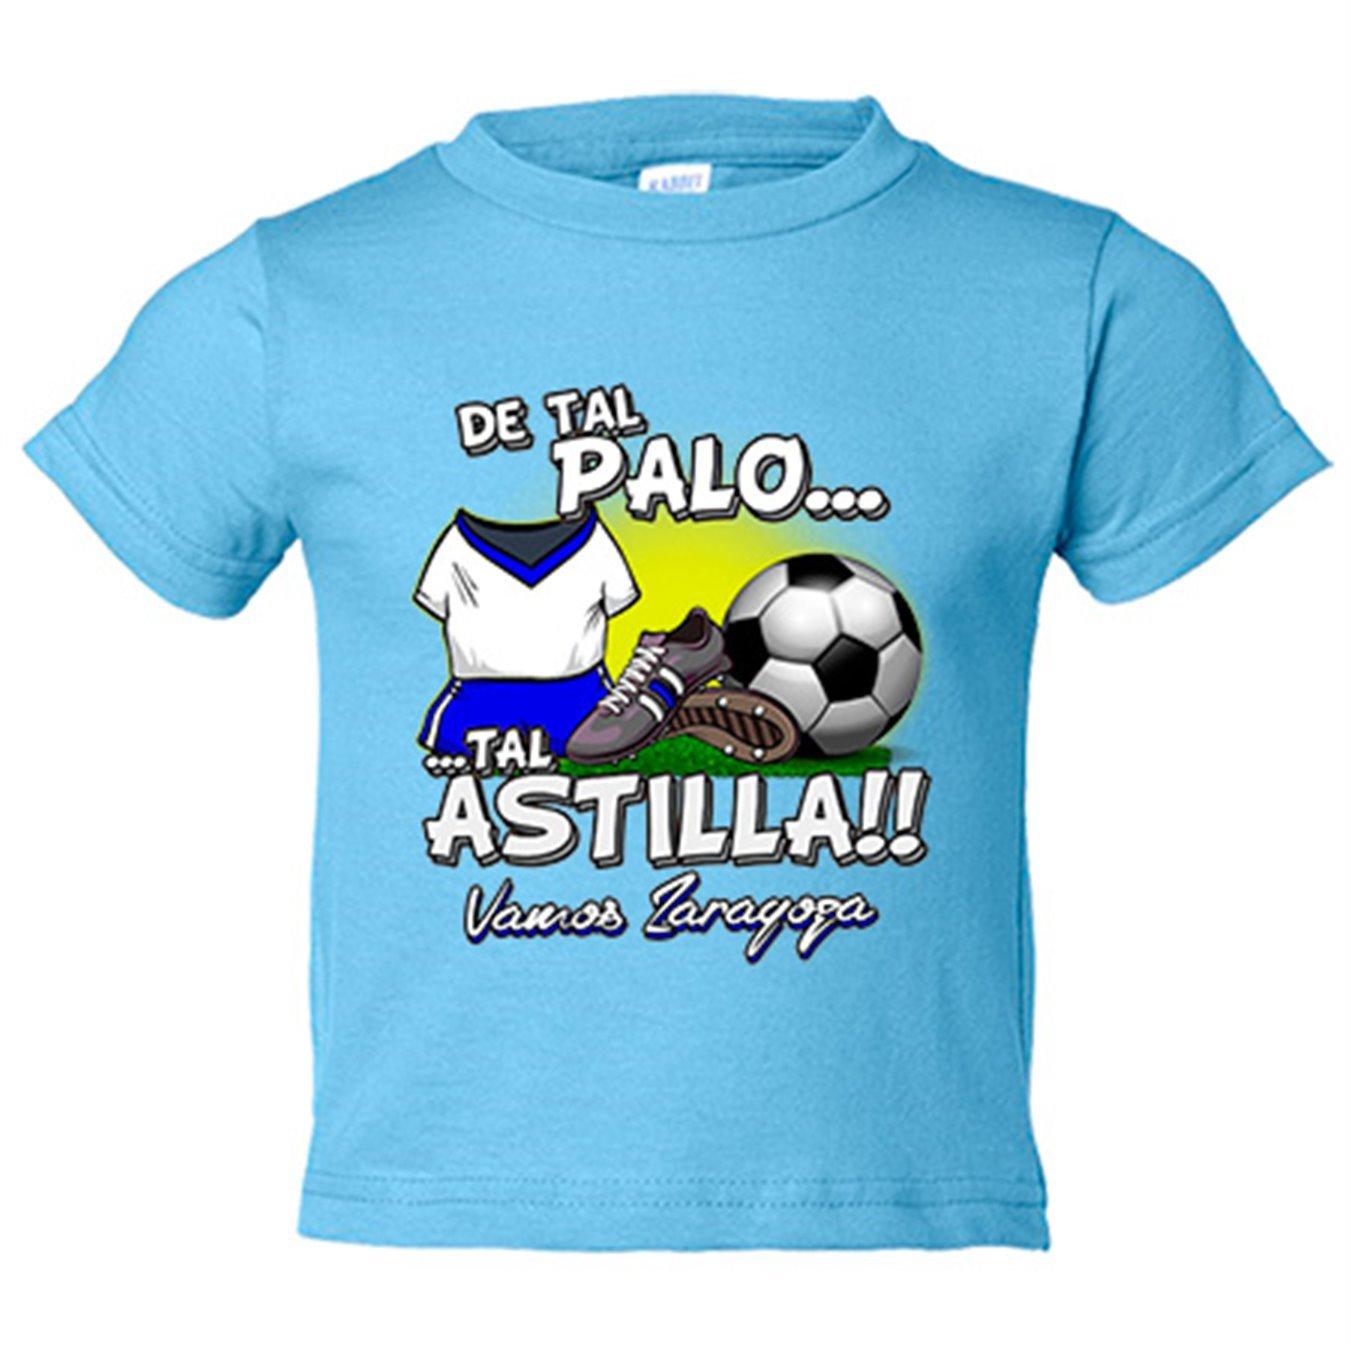 Camiseta niño De tal palo tal astilla Zaragoza fútbol ...